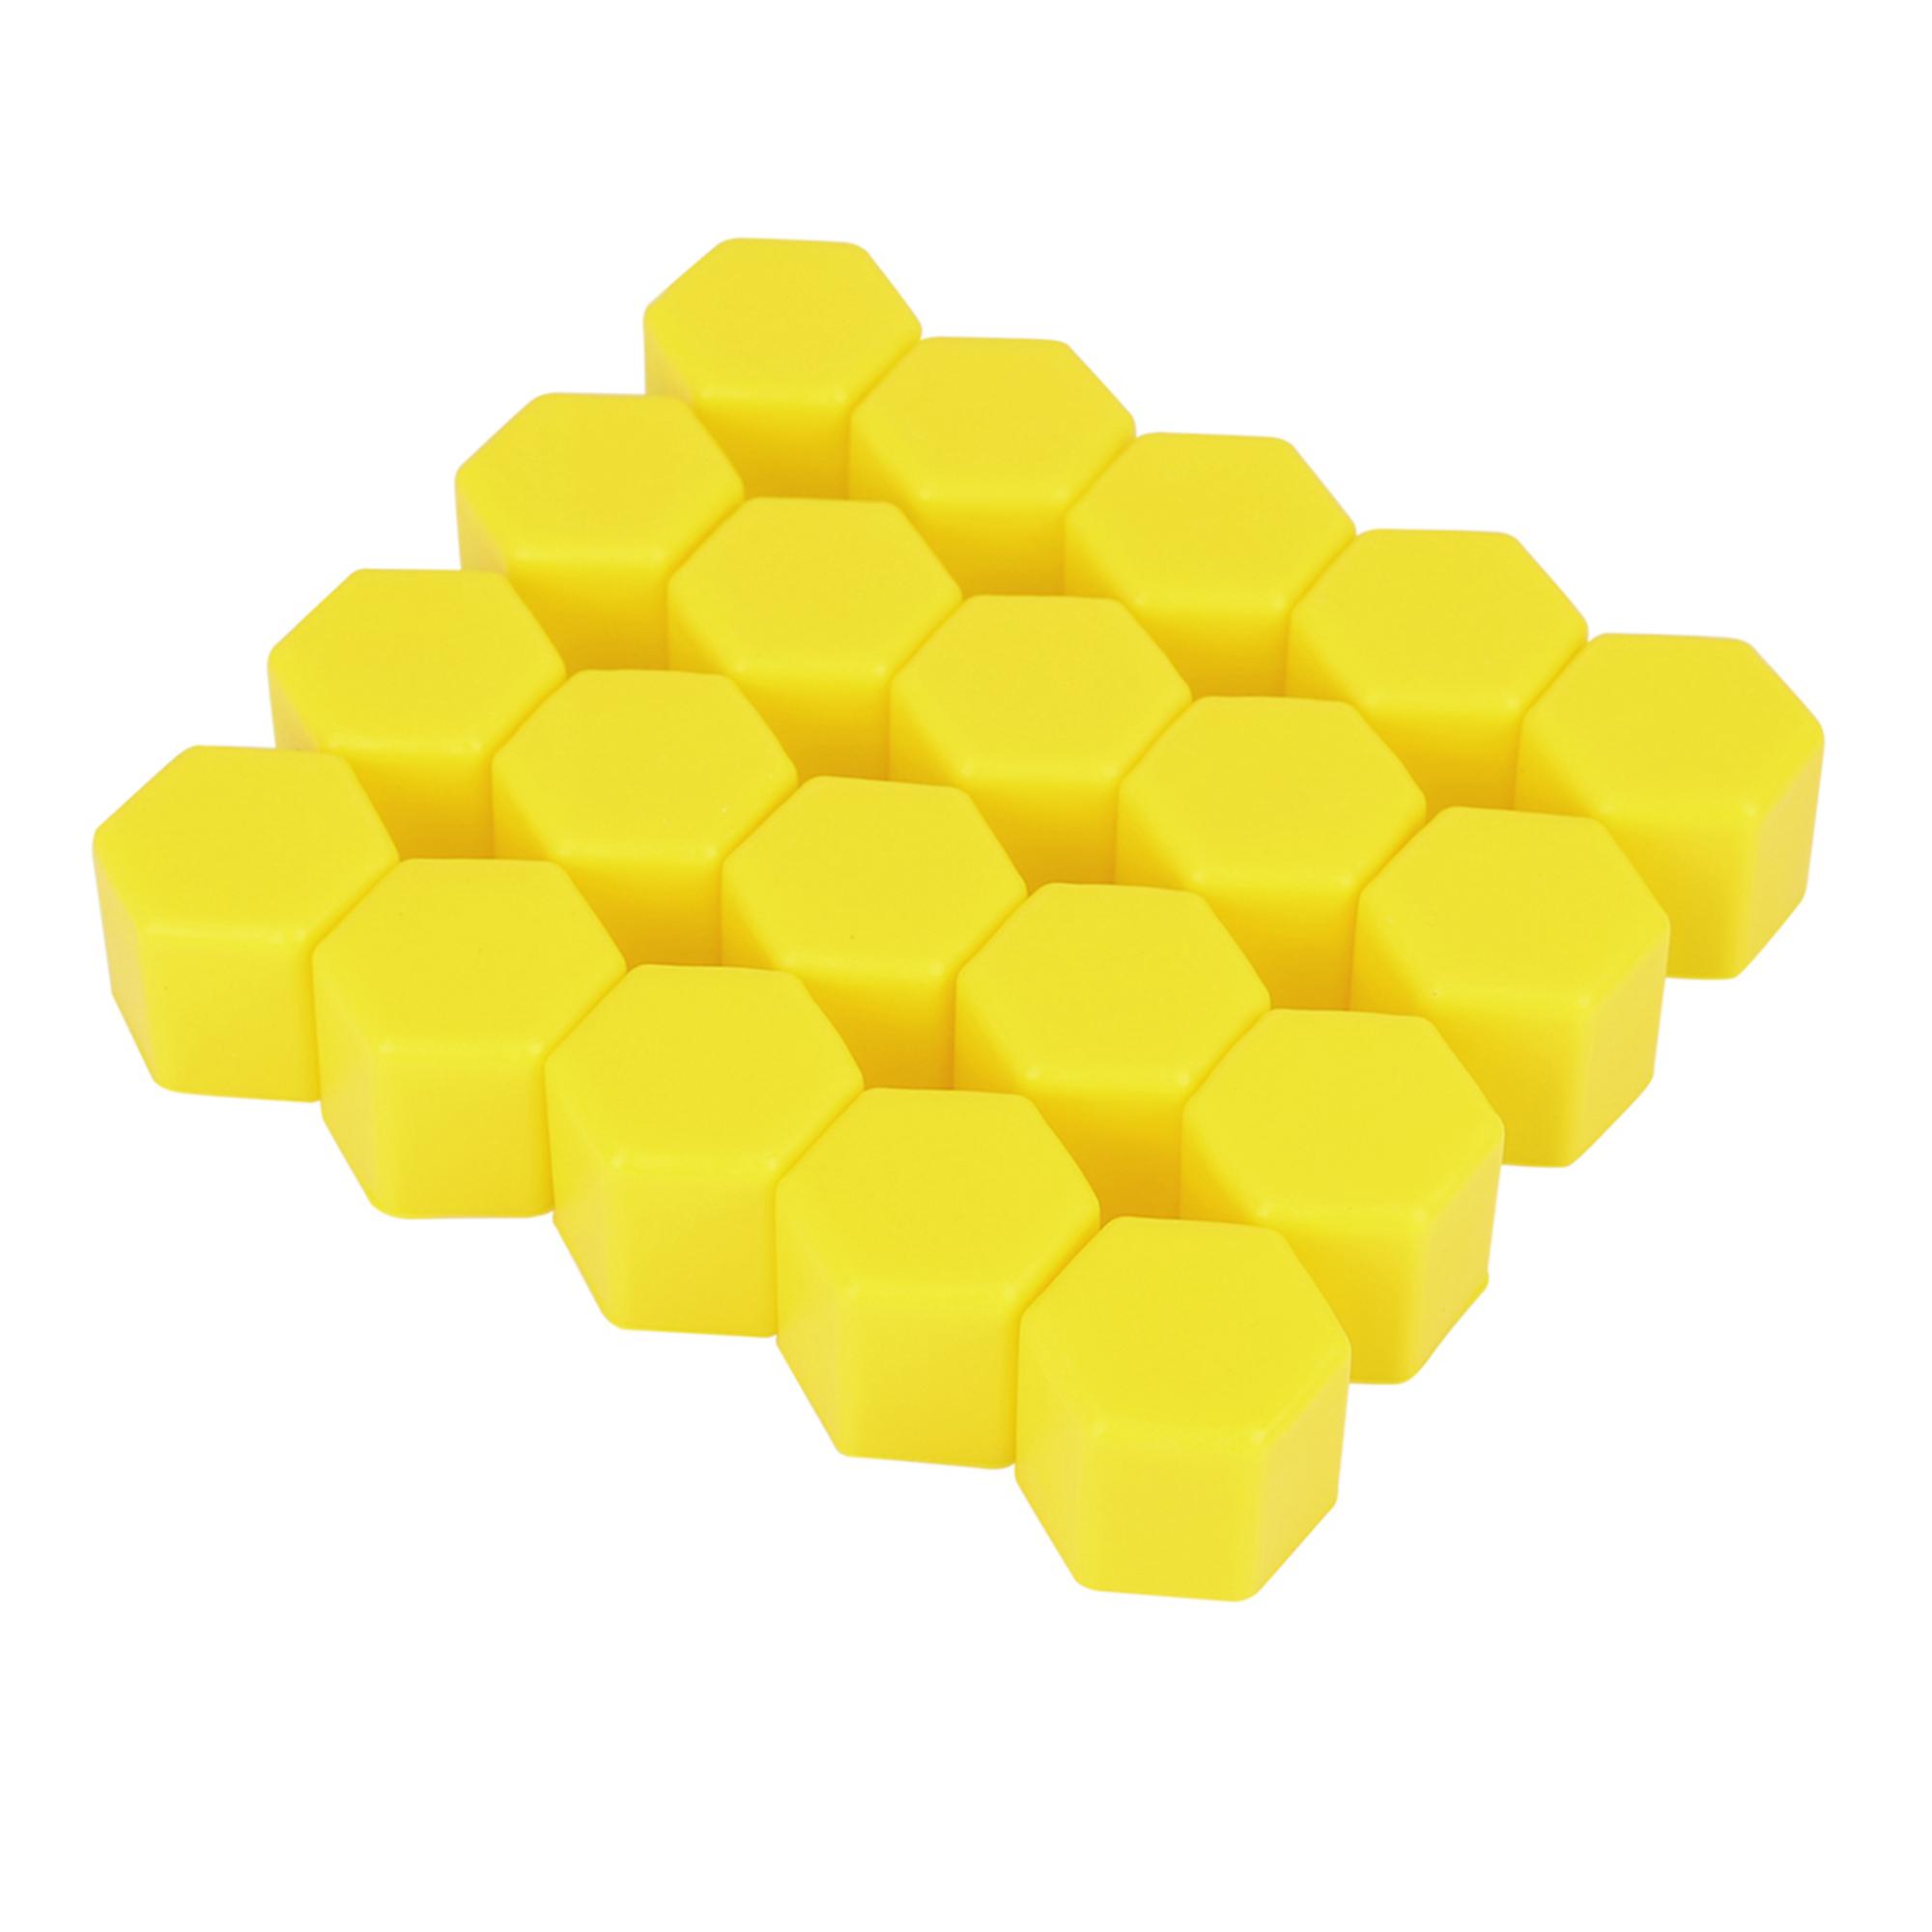 20pcs 17mm Yellow Silicone Car Wheel Lug Hub Covers Nut Bolt Screw Dust Caps